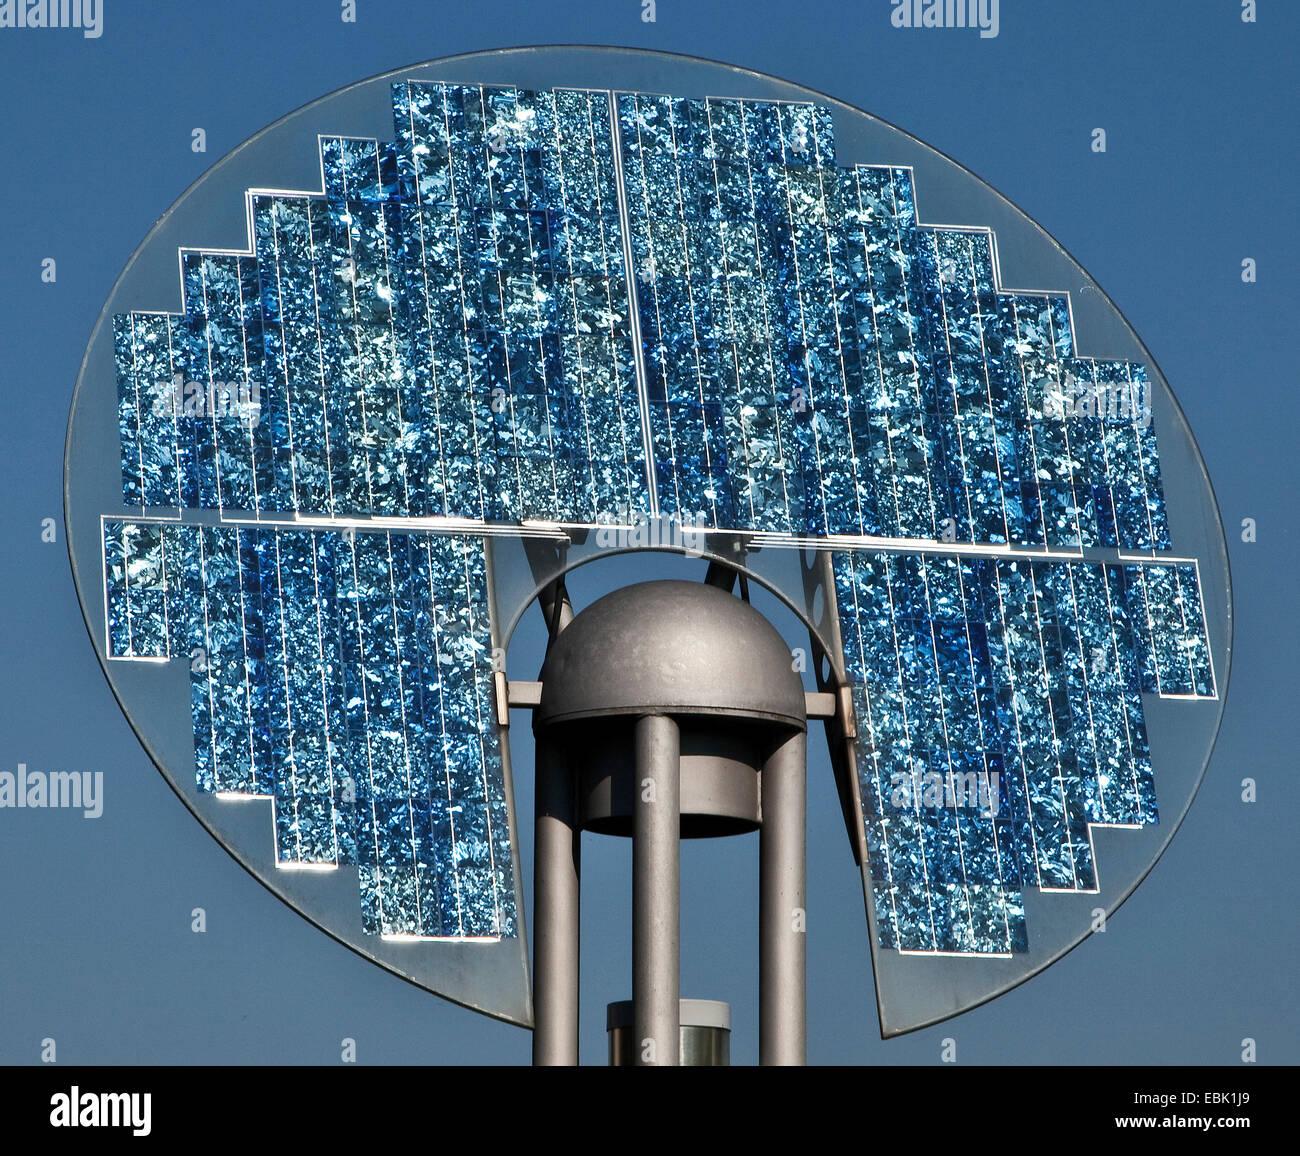 sculpture with solar panel of Solarworld, Germany, North Rhine-Westphalia, Ruhr Area, Gelsenkirchen - Stock Image